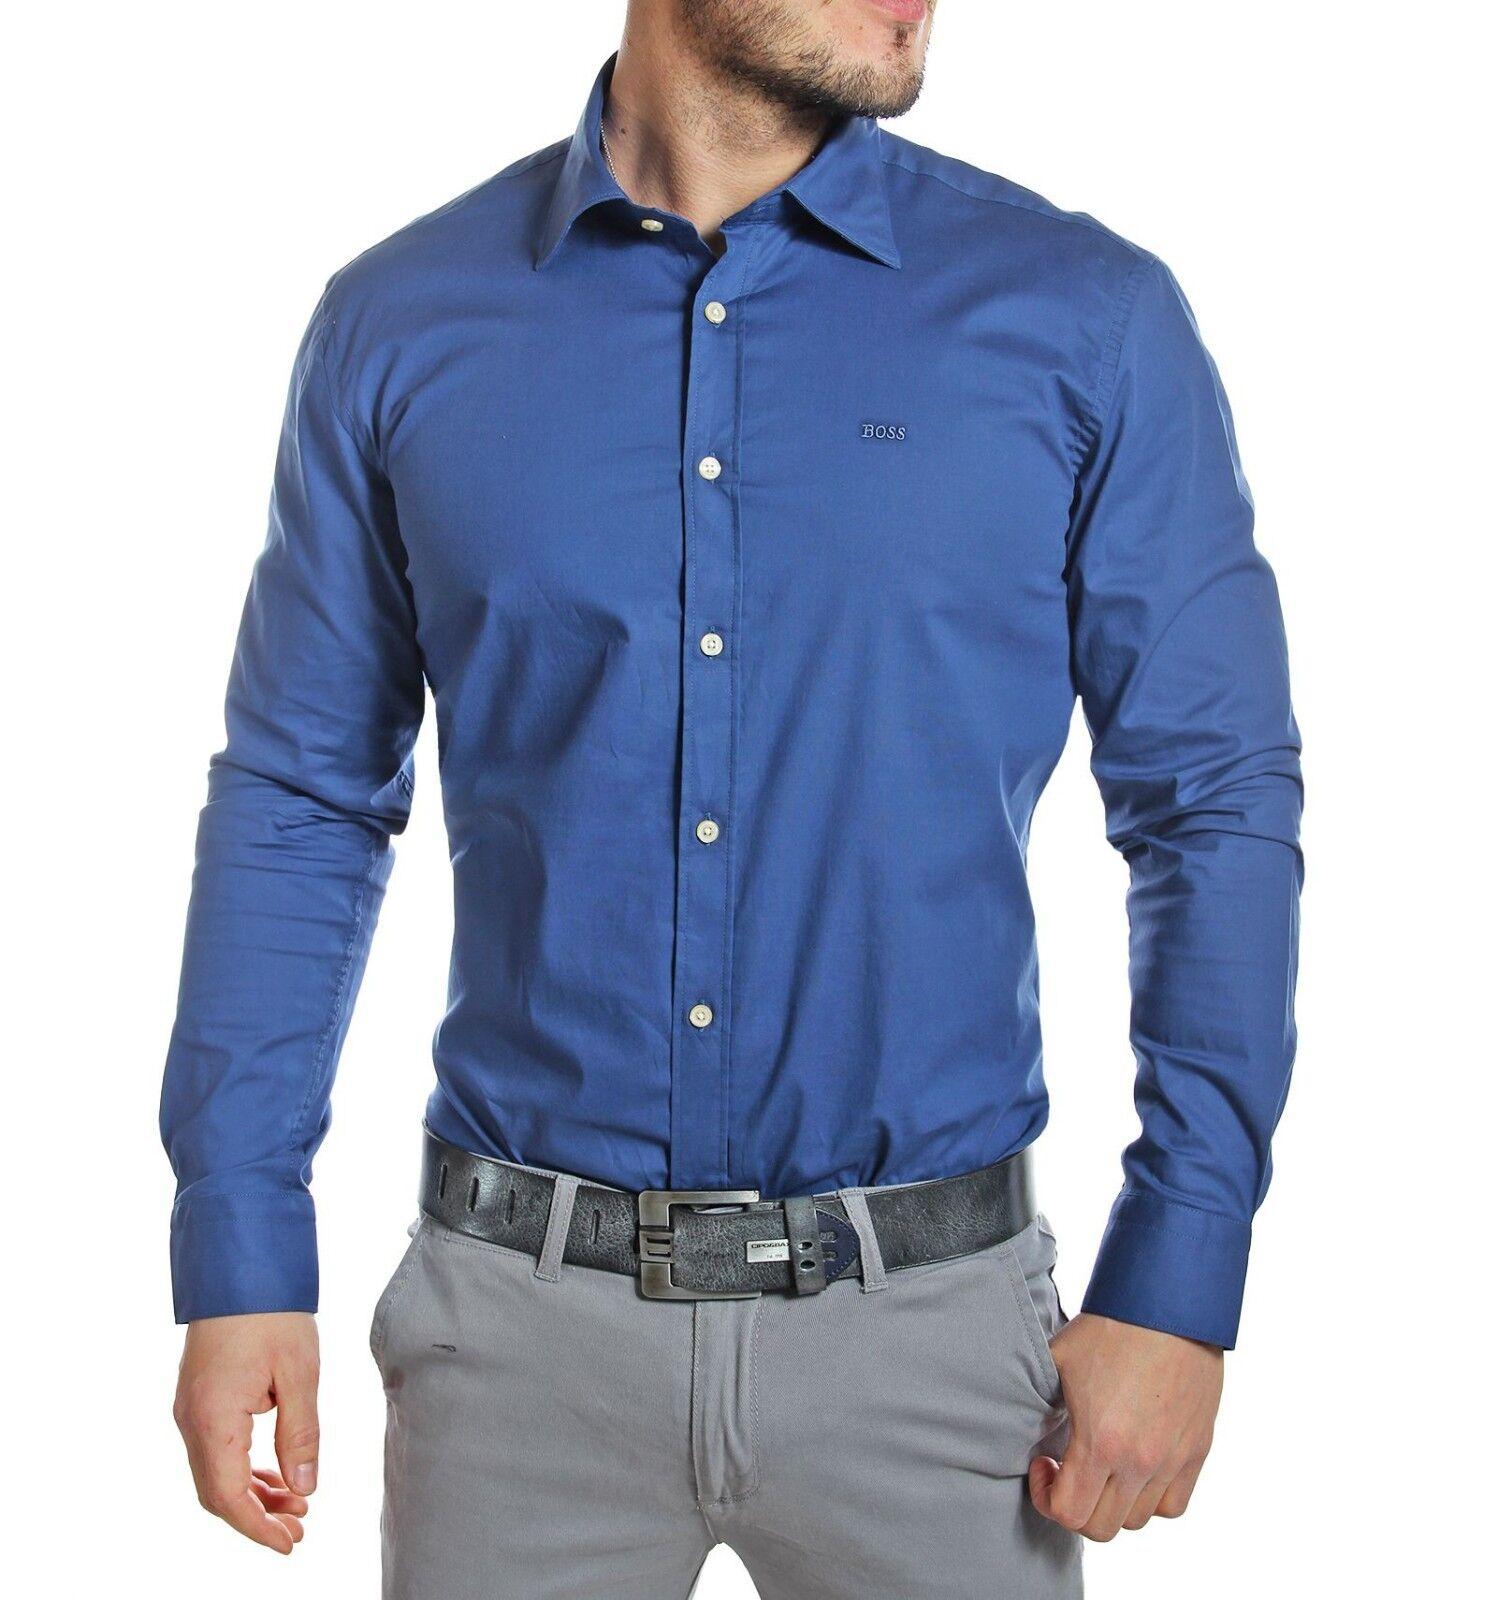 Indigo (Dress Shirt)